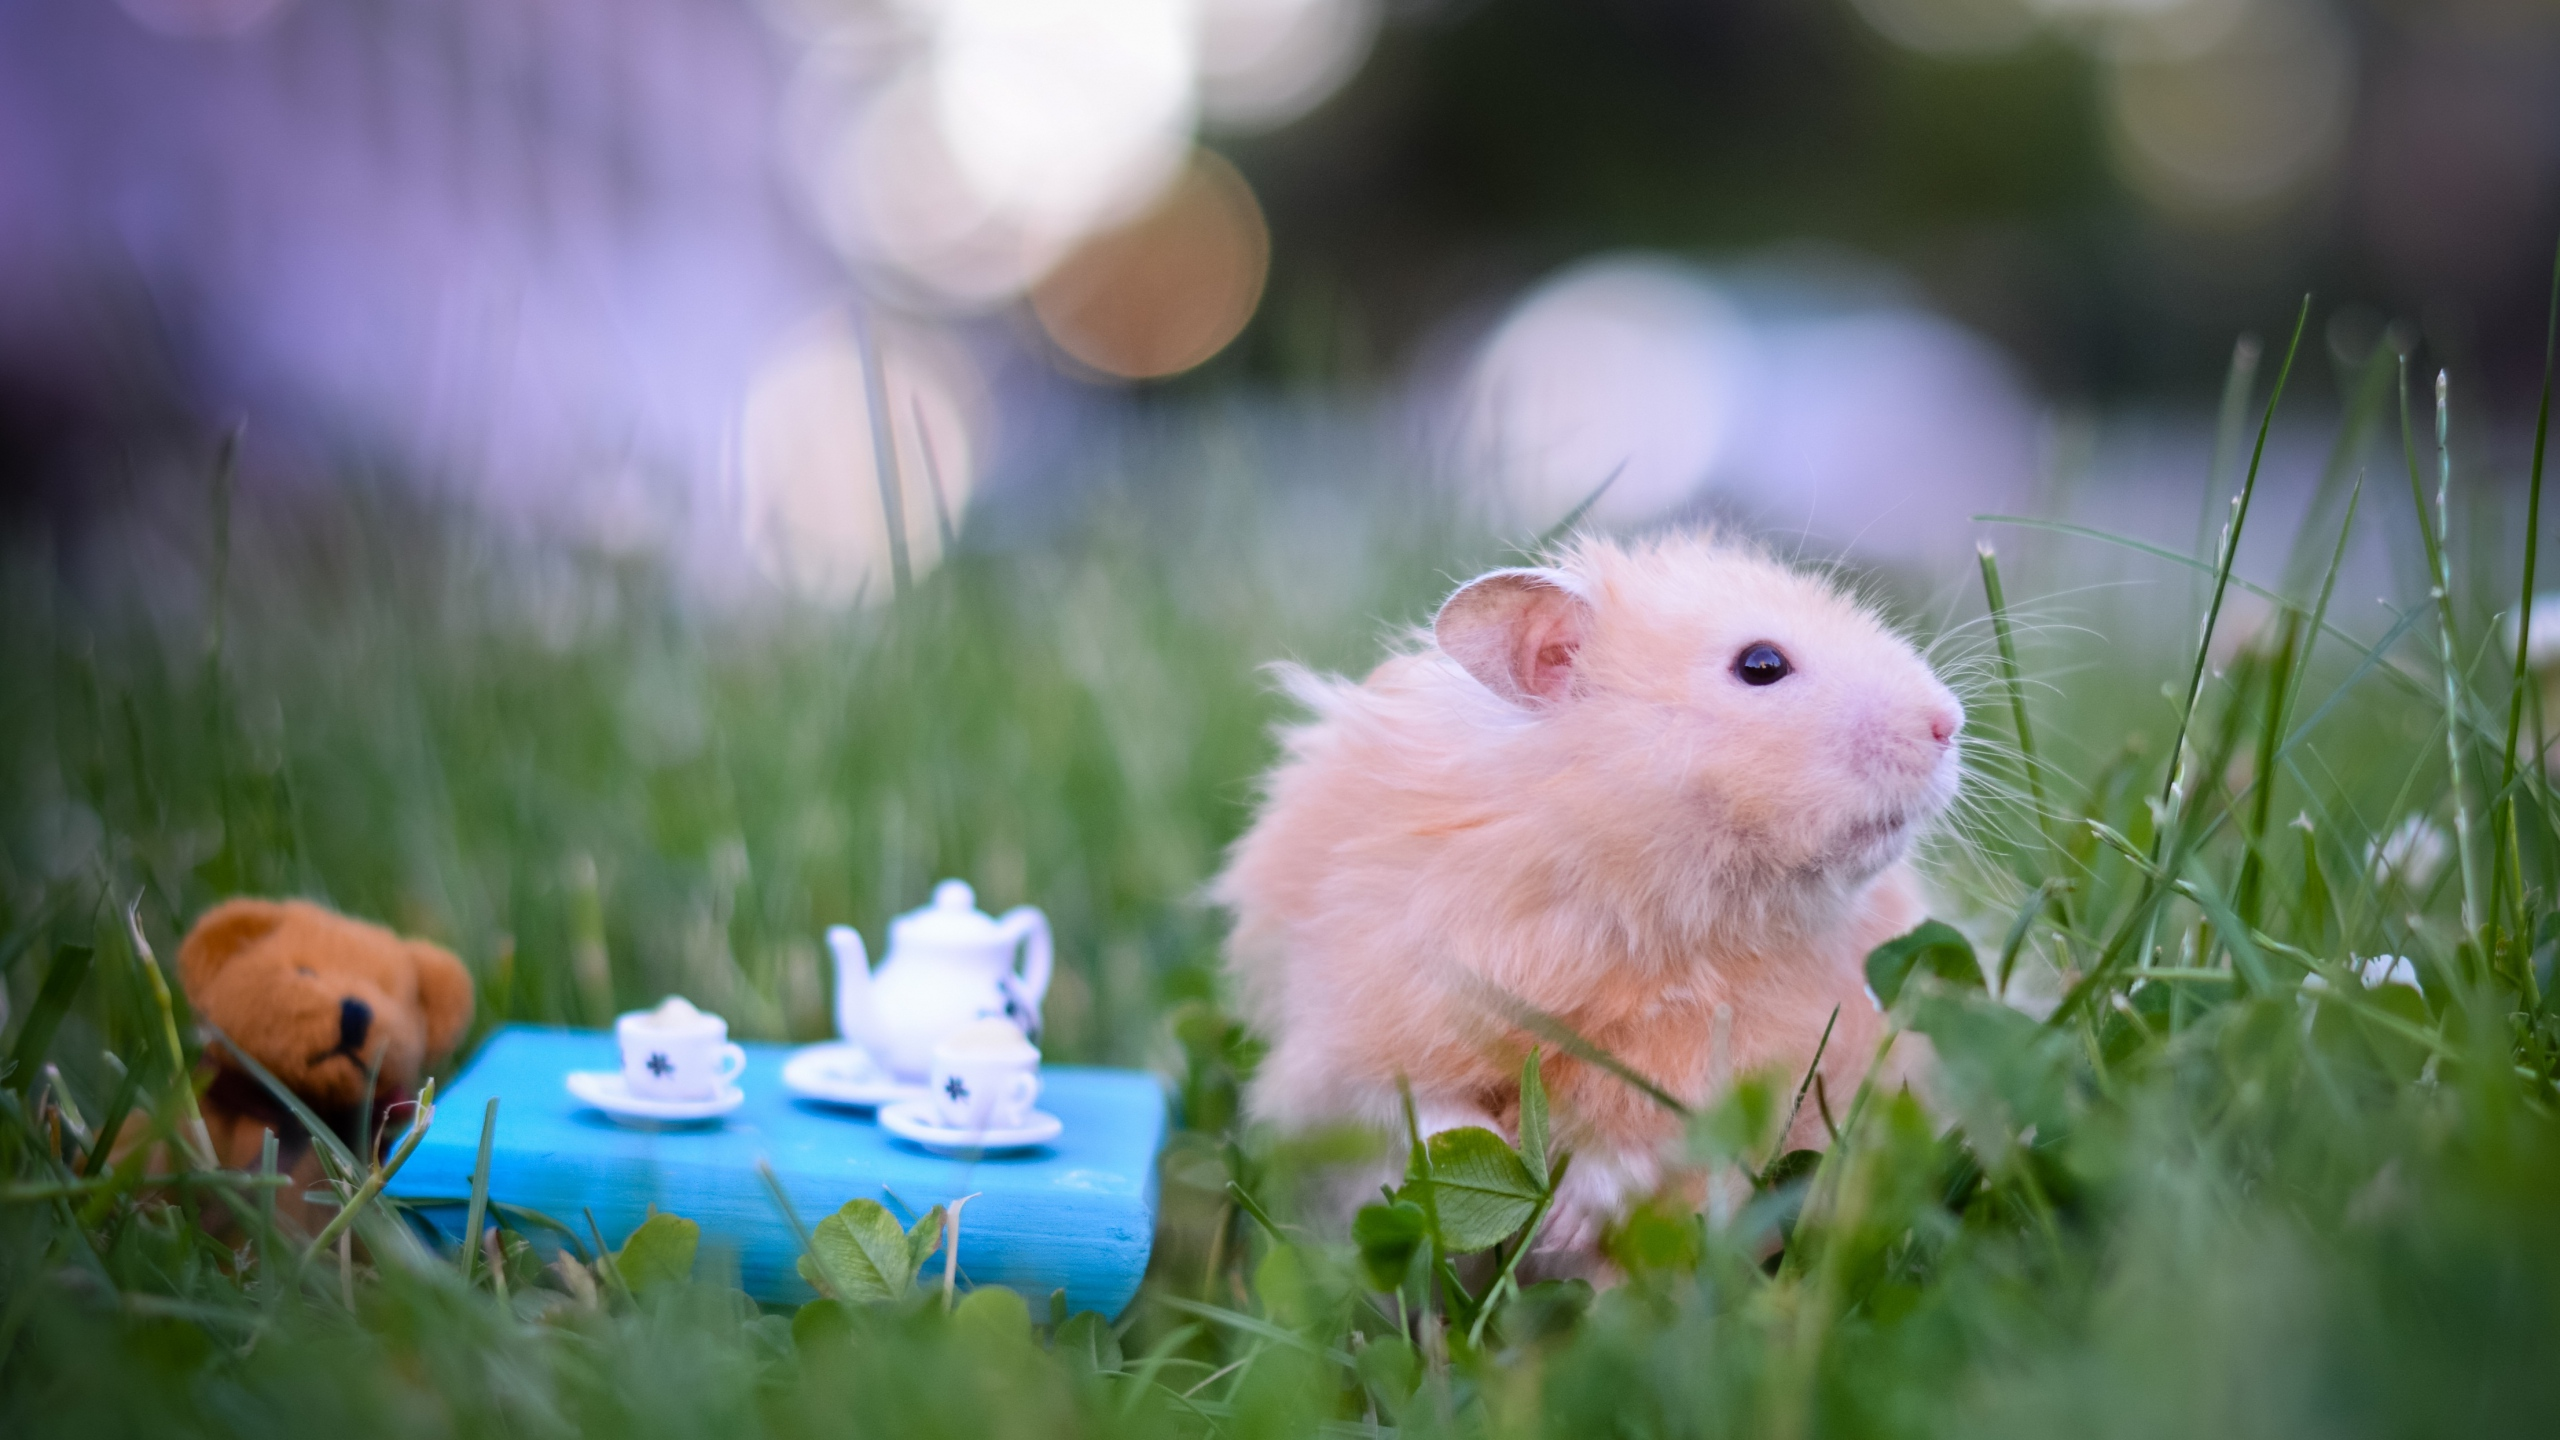 Animal Funny Hamster On Park Wallpaper Full HD 12194 Wallpaper High 2560x1440